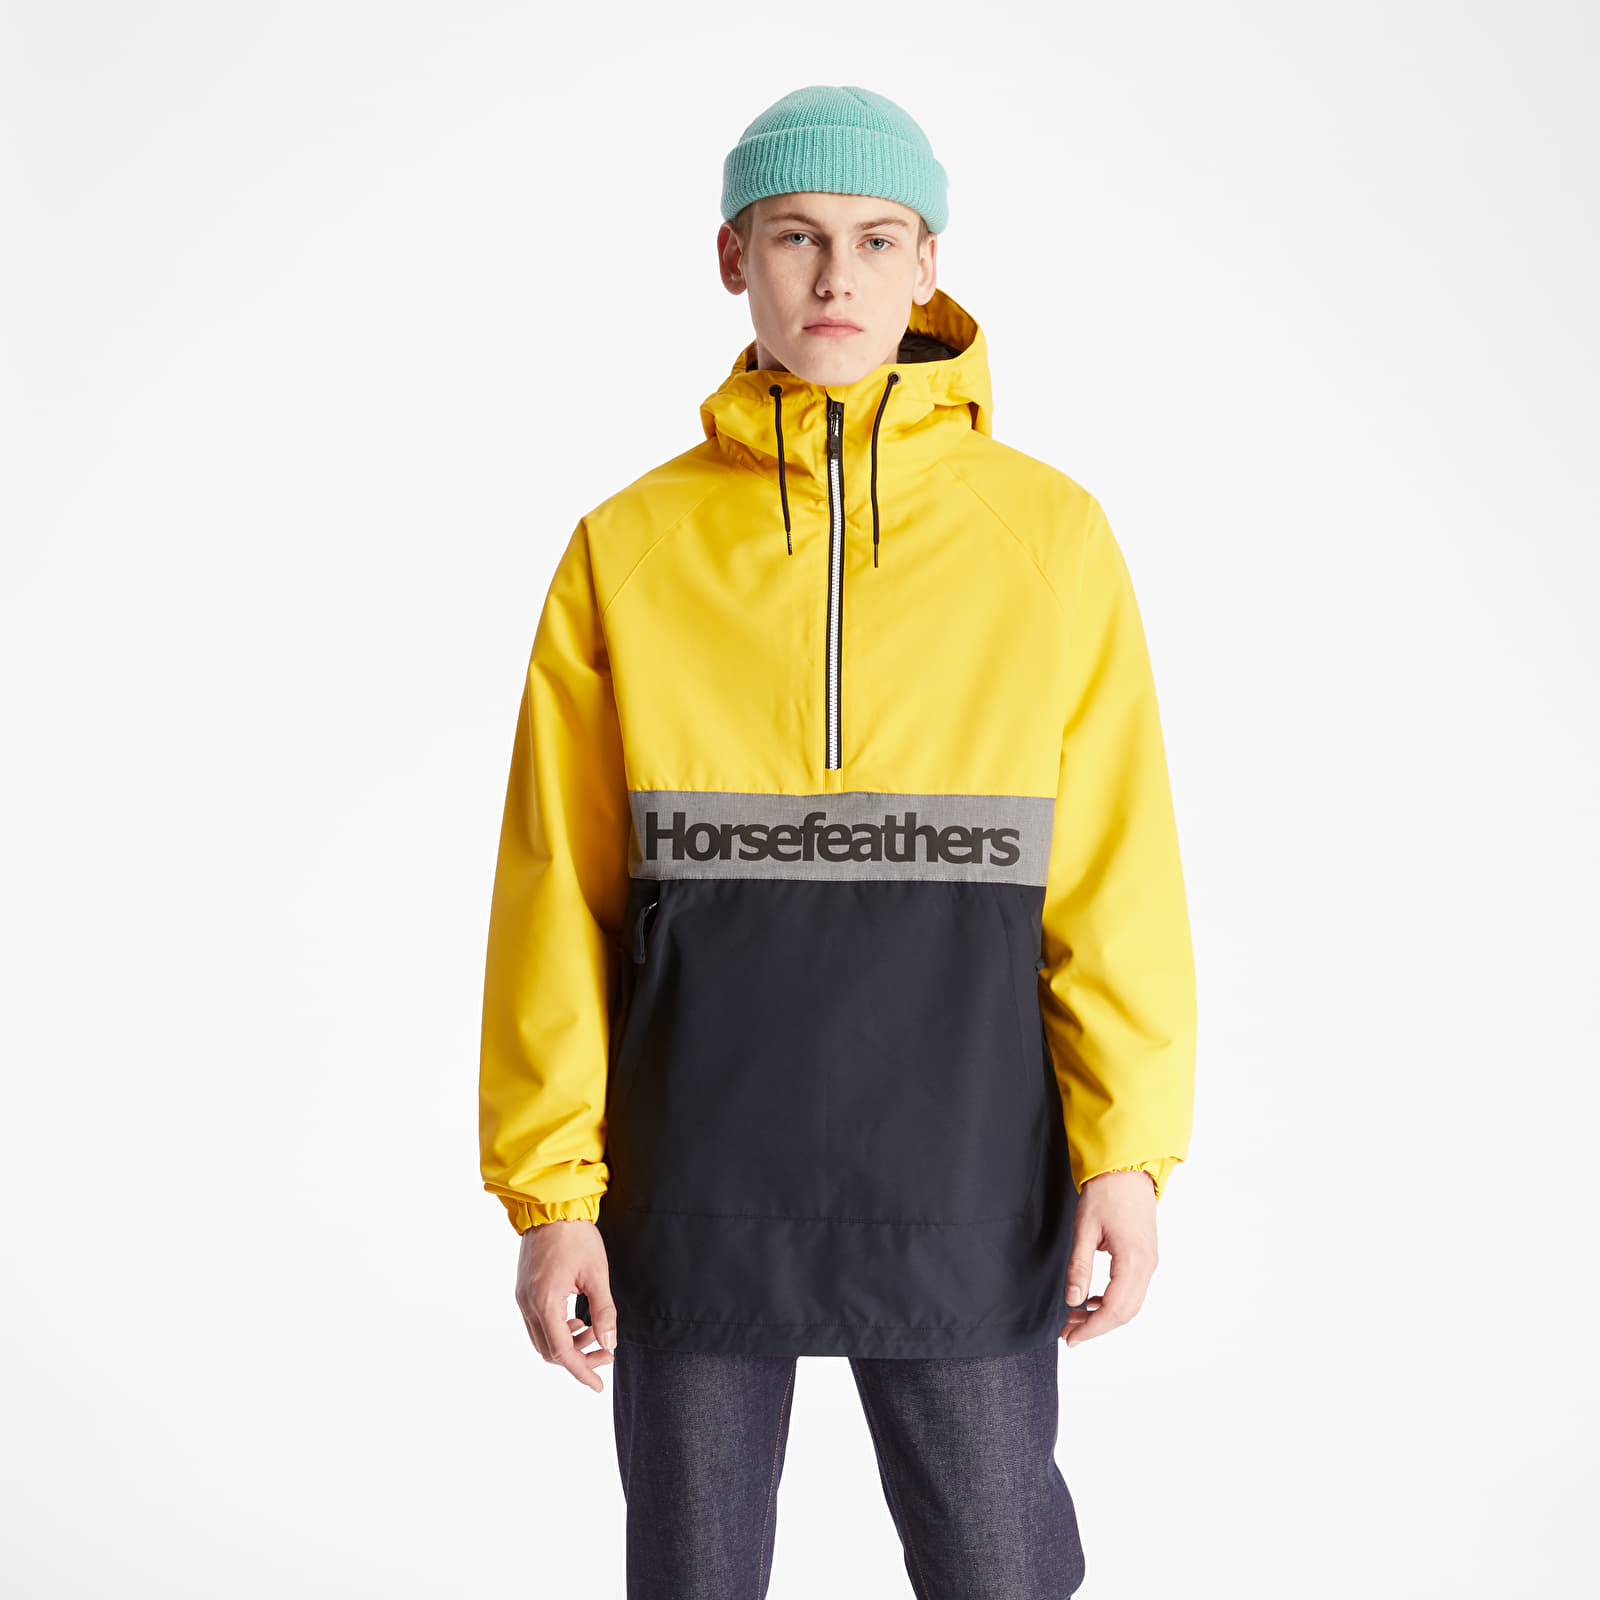 Men's Clothing Horsefeathers Perch Jacket Lemon